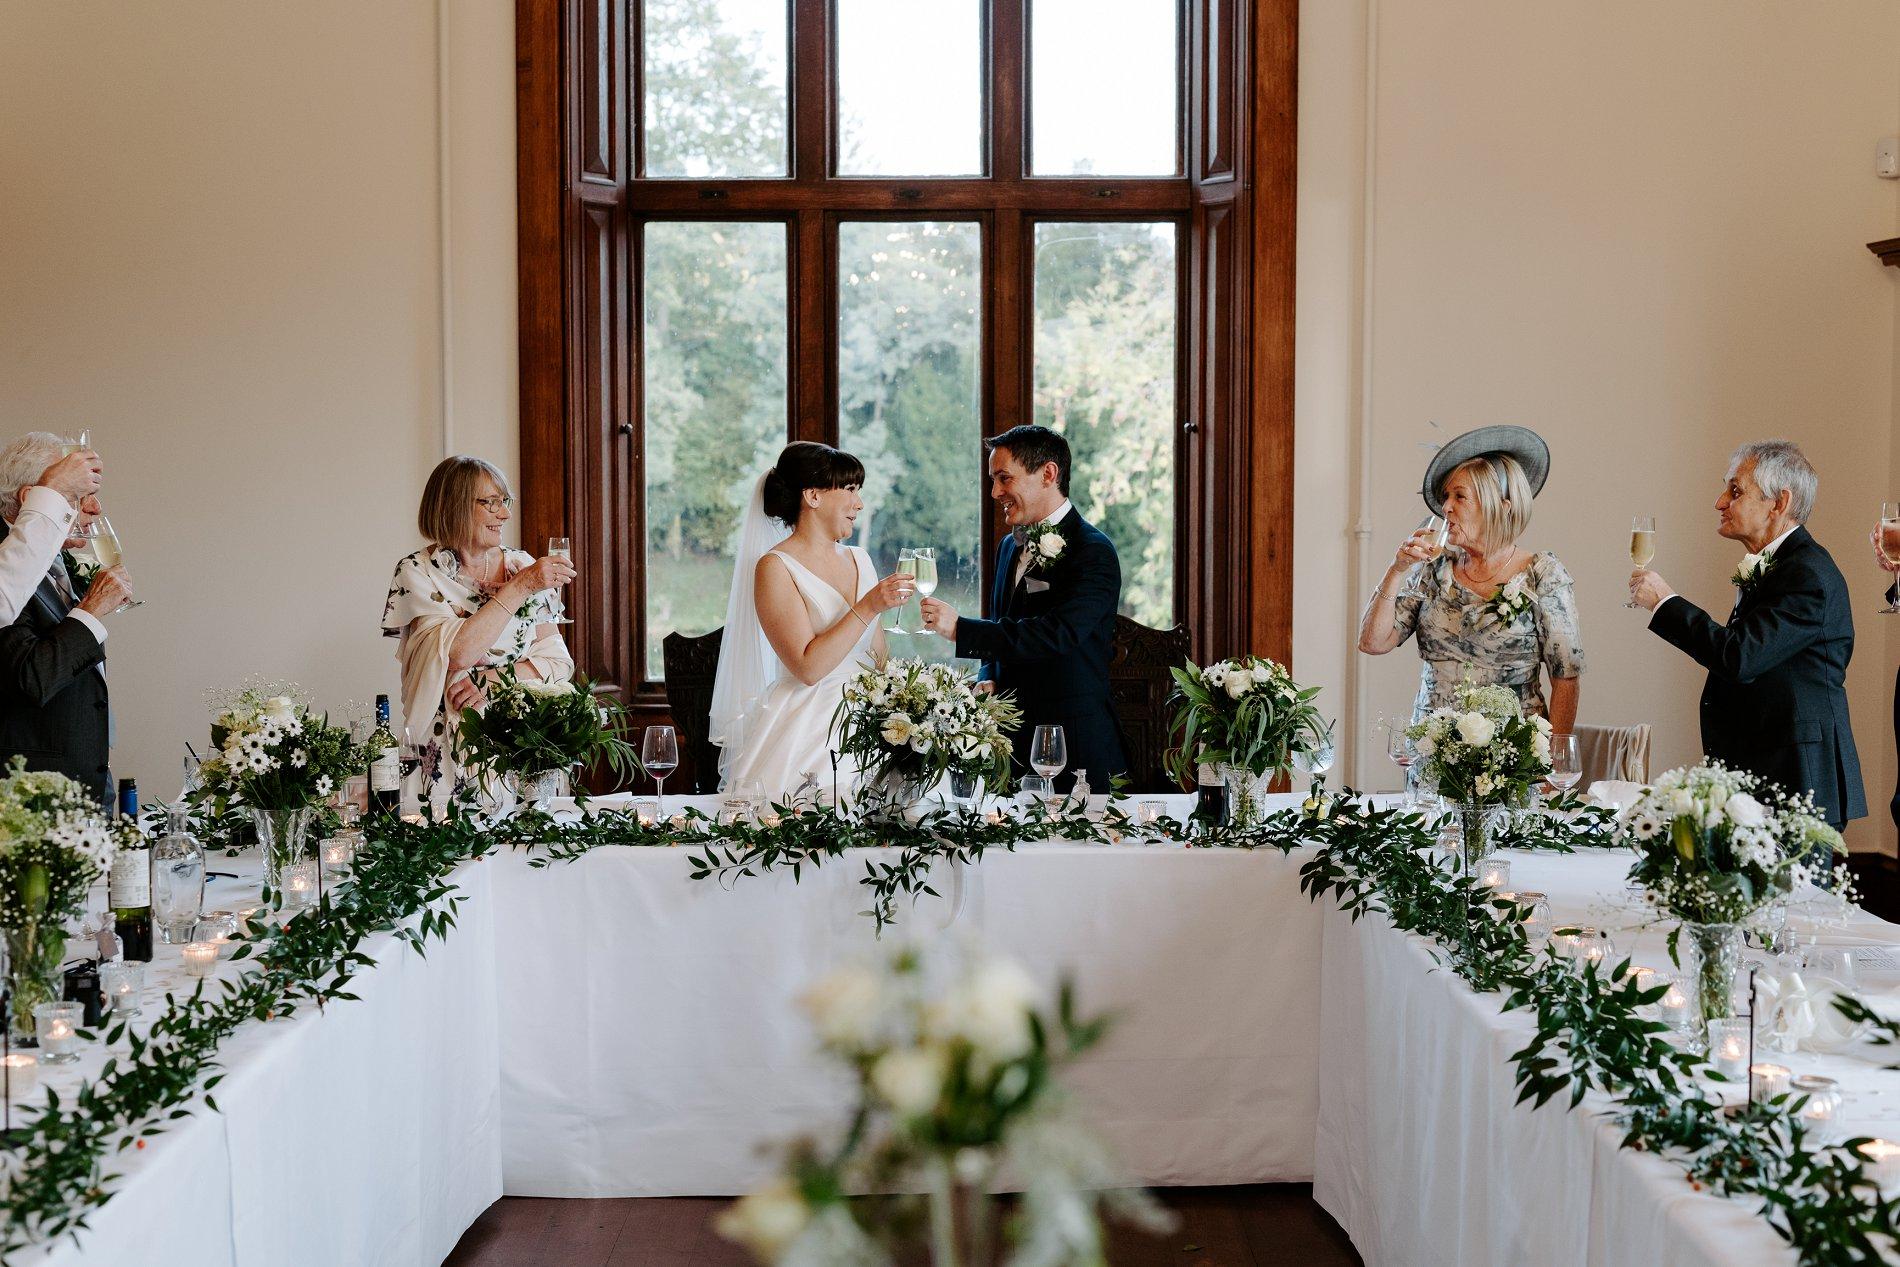 An Elegant White Wedding at Thicket Priory (c) Carla Whittingham Photography (73)